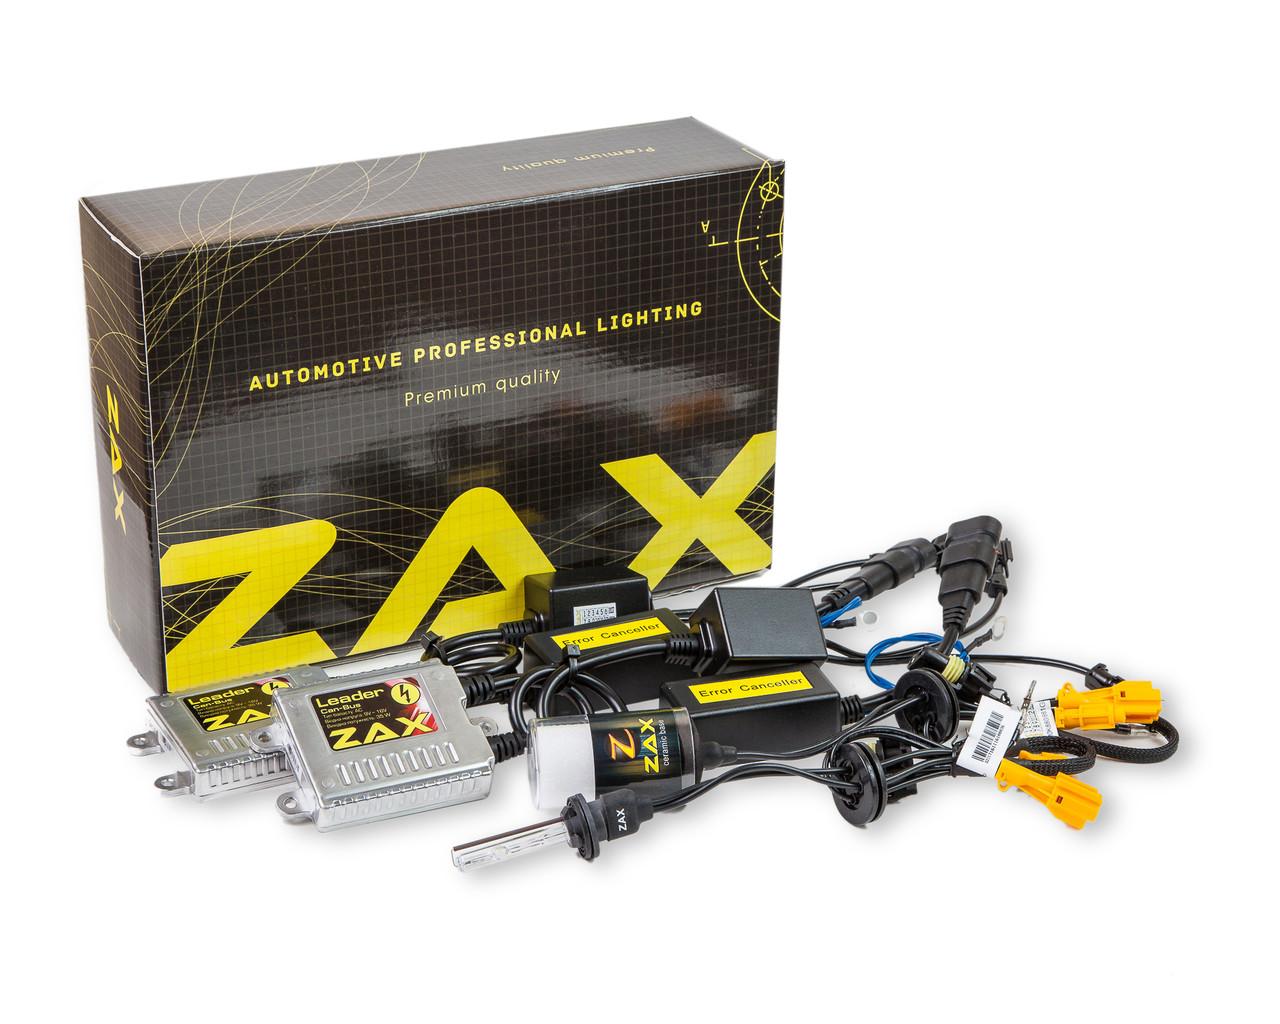 Комплект ксенона ZAX Leader Can-Bus 35W 9-16V H27 (880/881) Ceramic 5000K